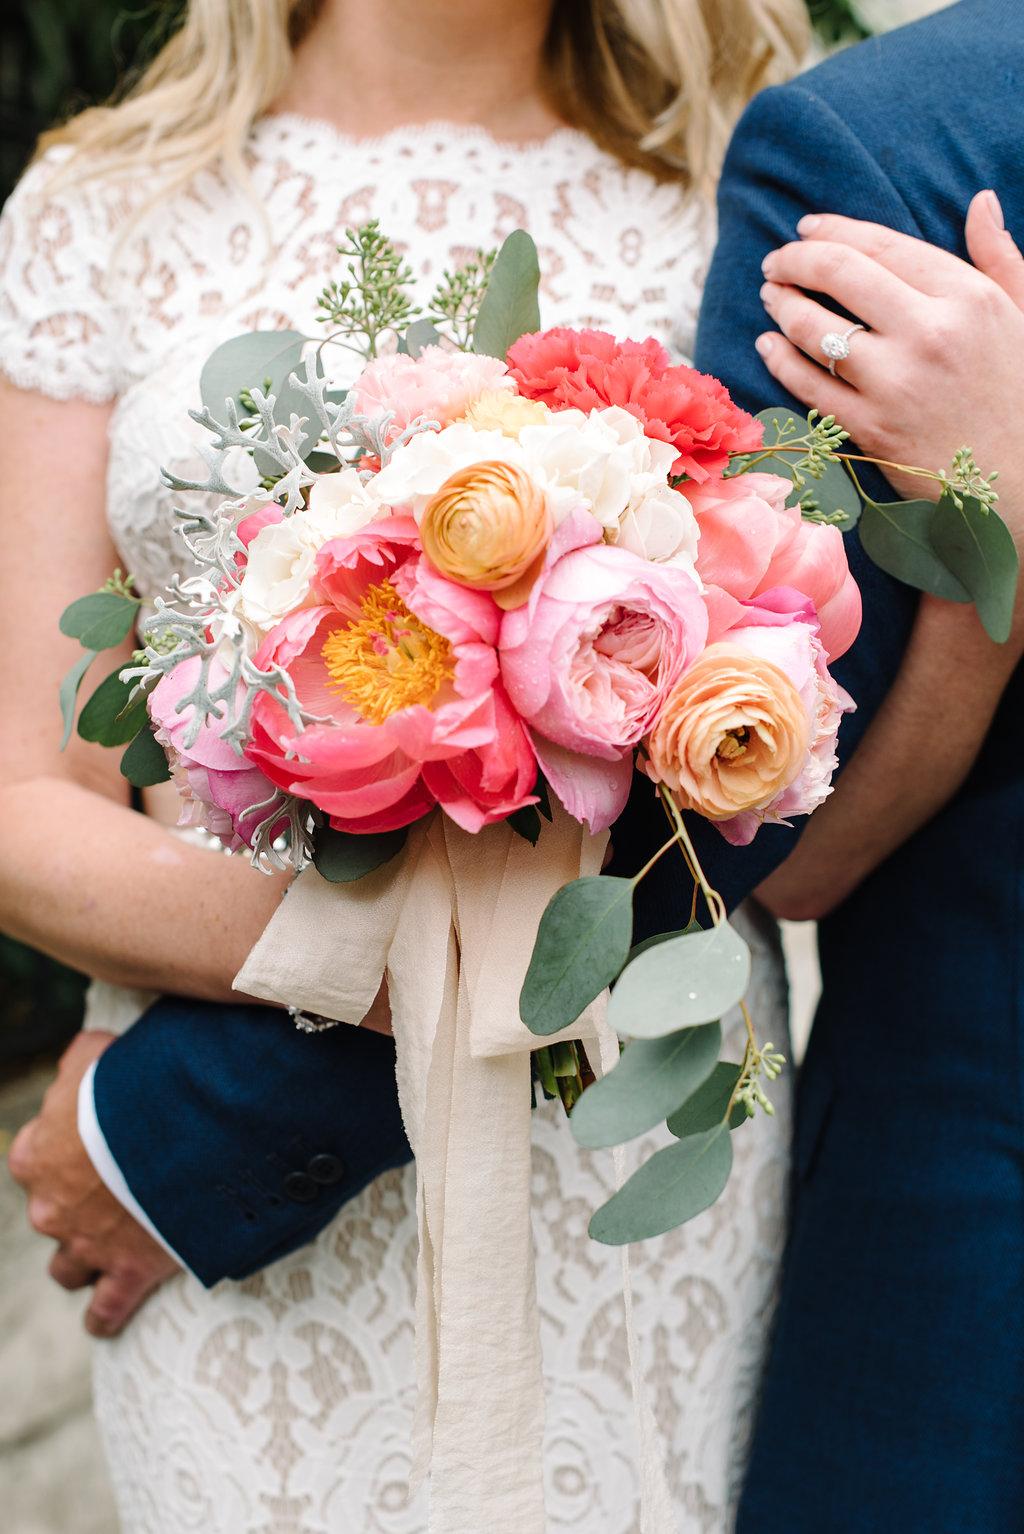 charleston elopement planners, scarlet plan & design, coral, tangerine, hot pink, peach bridal bouquet